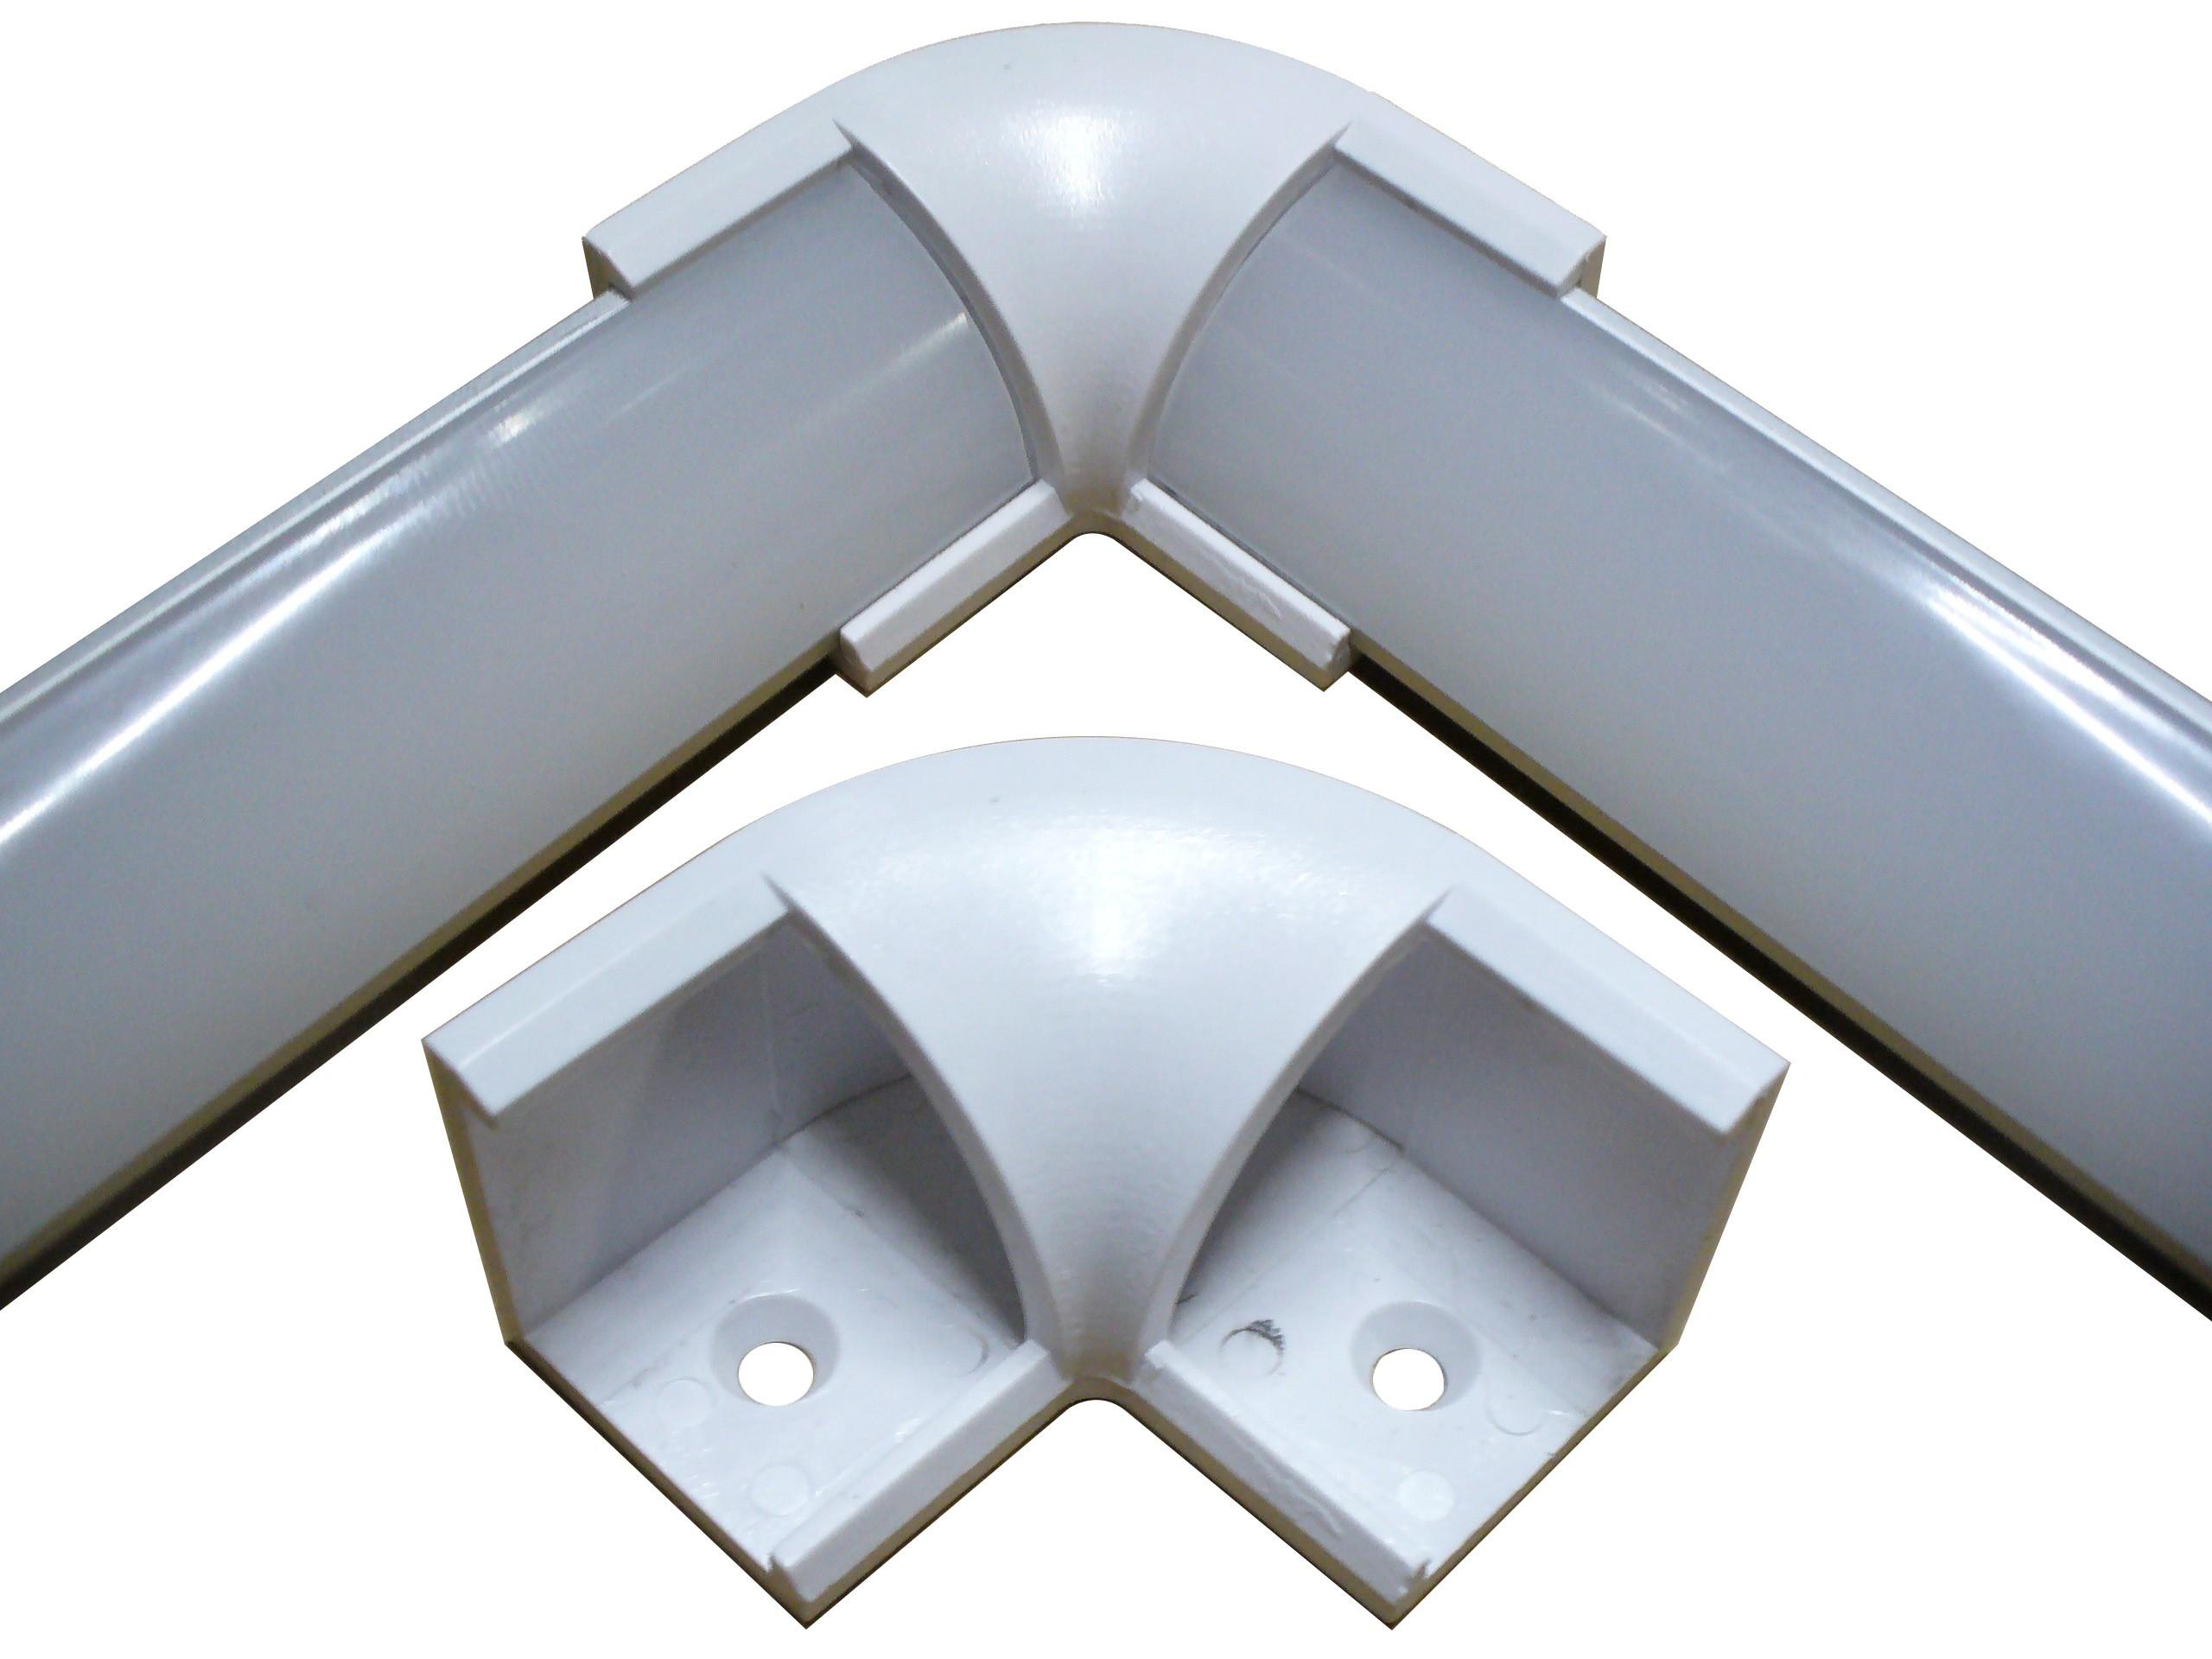 profil u pvc castorama ucpuesol pvc exclusive almeria de tarkett chez castorama disponible en. Black Bedroom Furniture Sets. Home Design Ideas